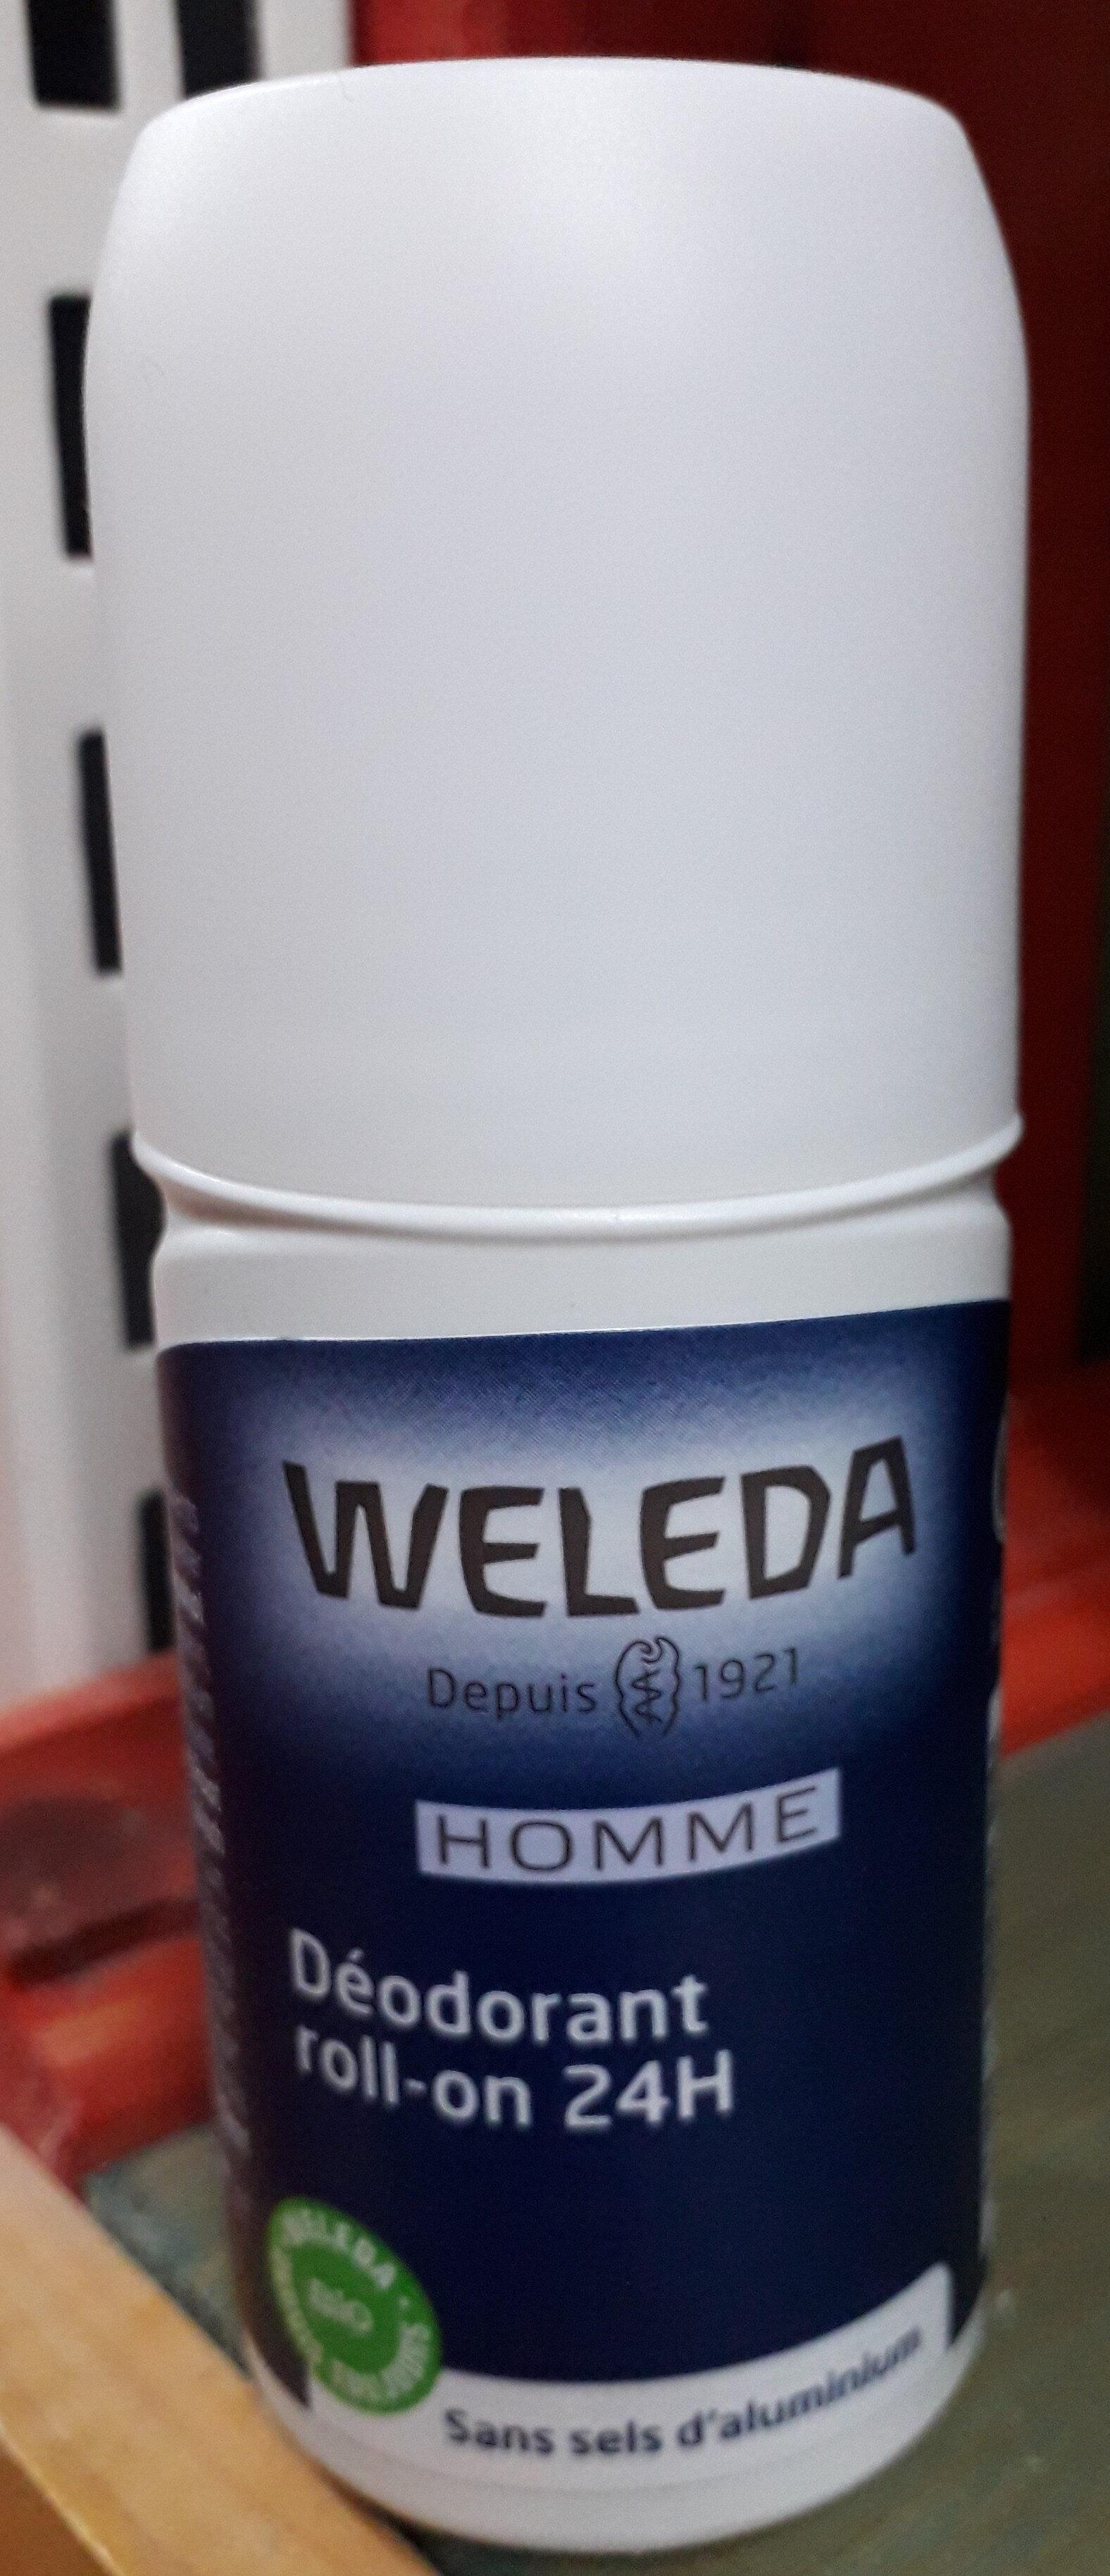 Déodorant roll-on 24H HOMME - Produit - fr